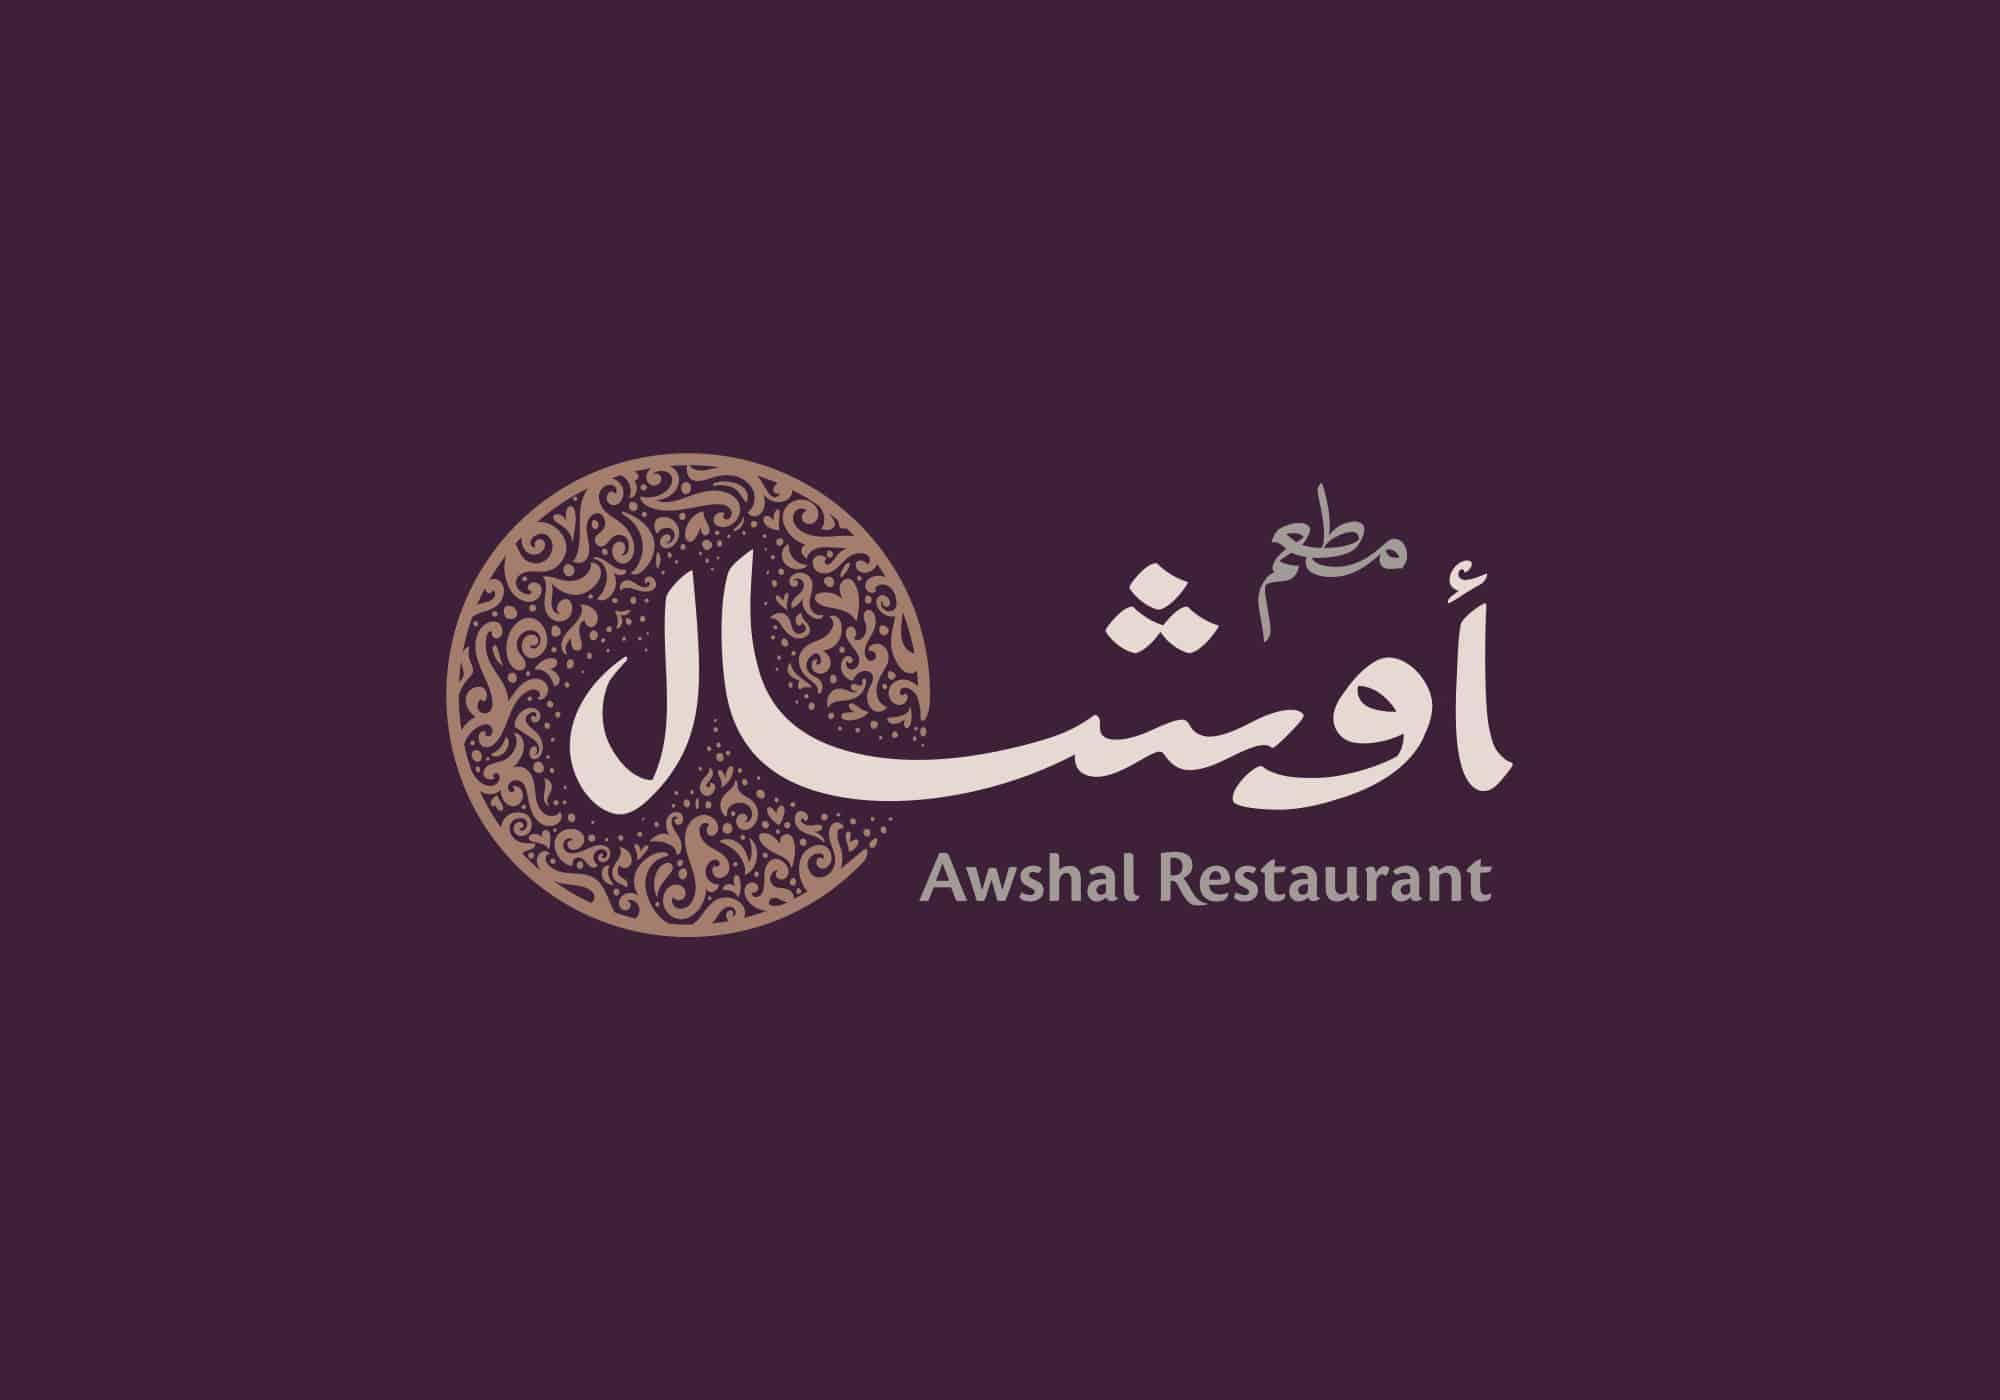 awshal-khawar-bilal-2